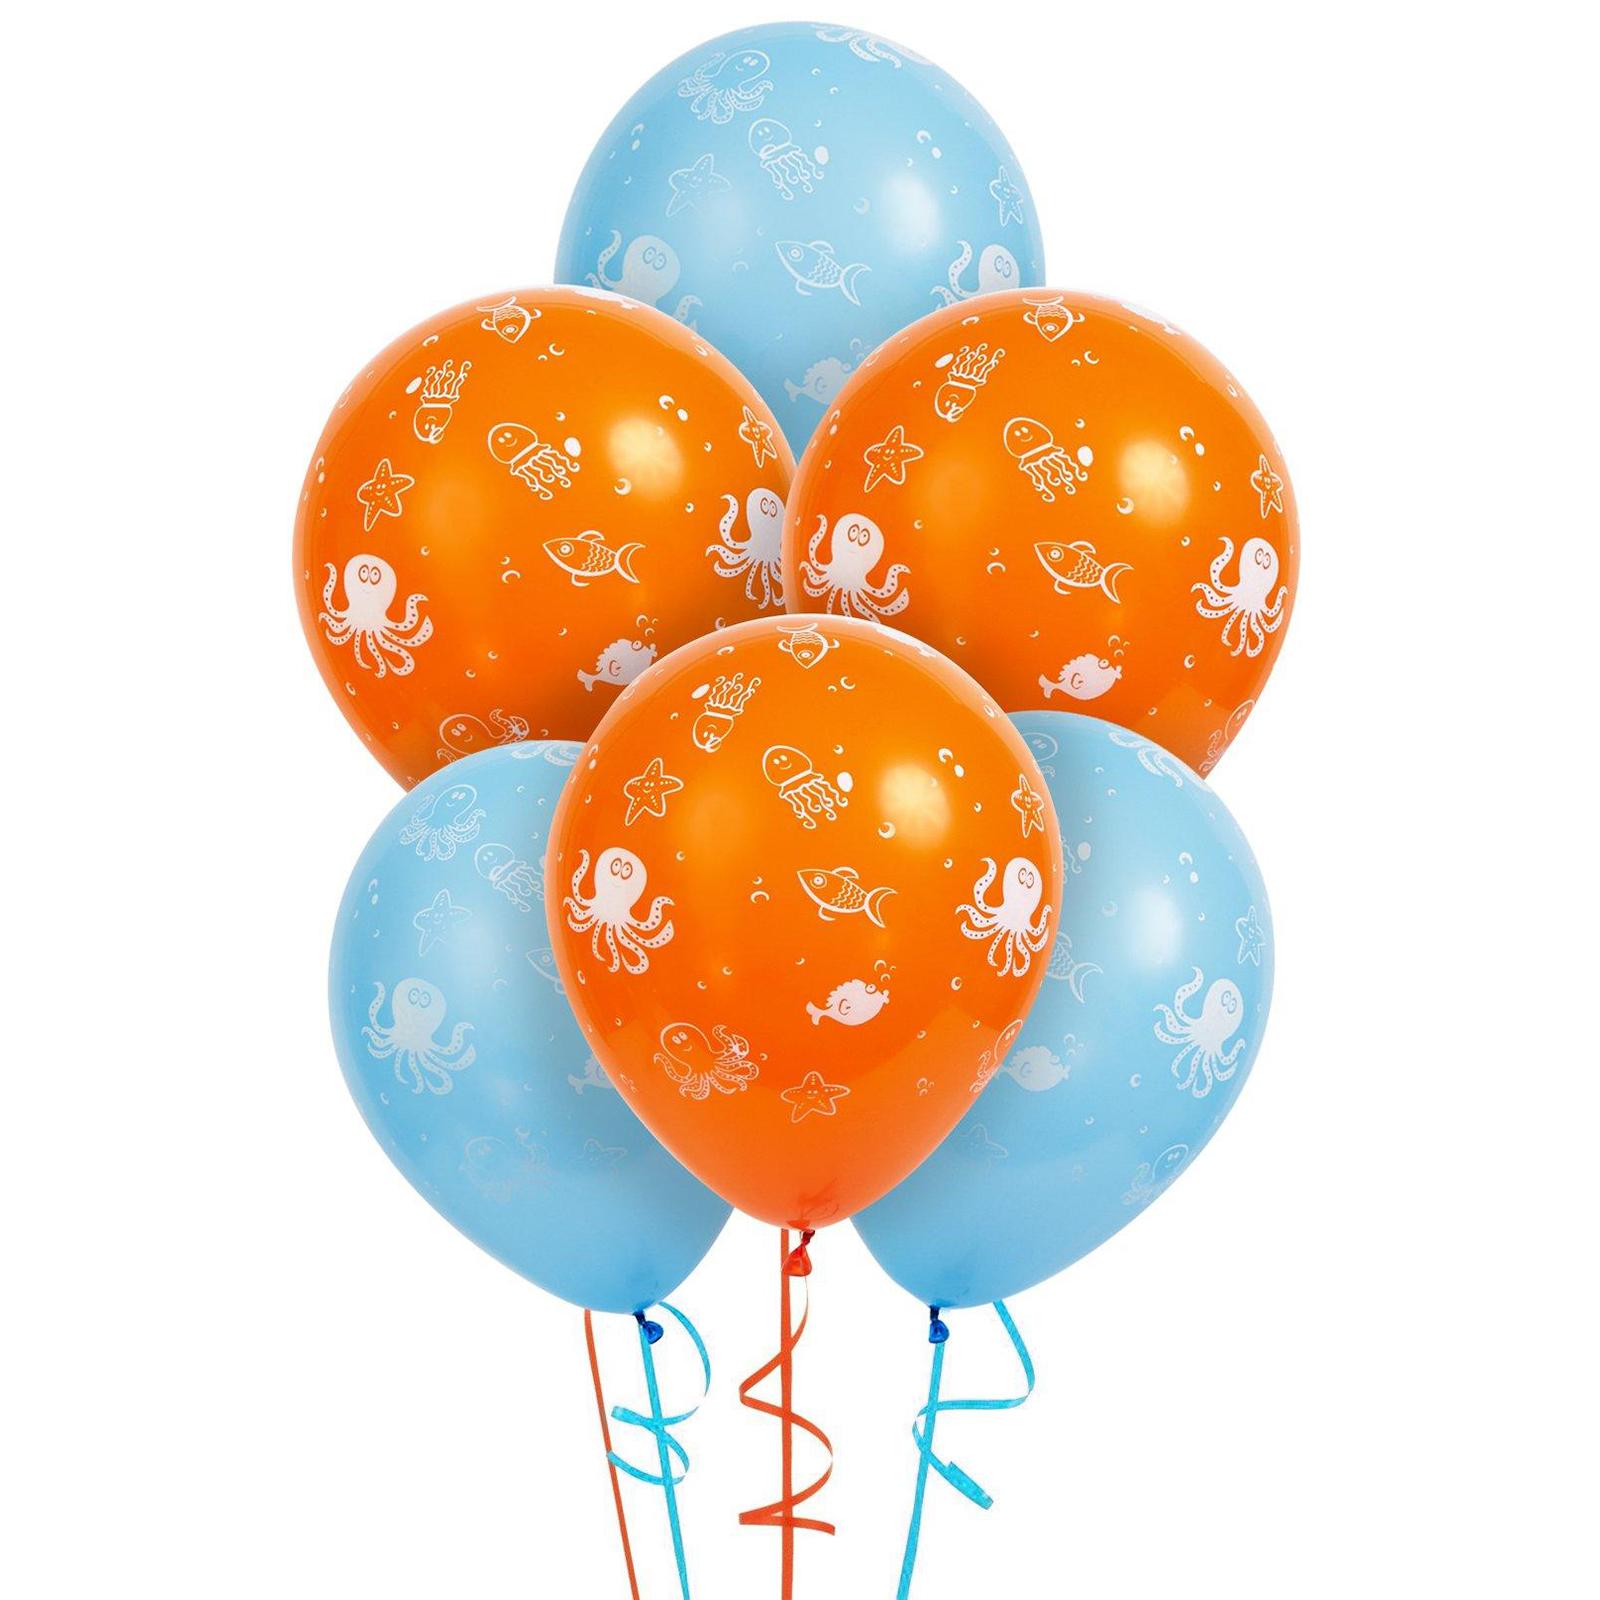 Octonauts Party Supplies 24 Latex Balloons